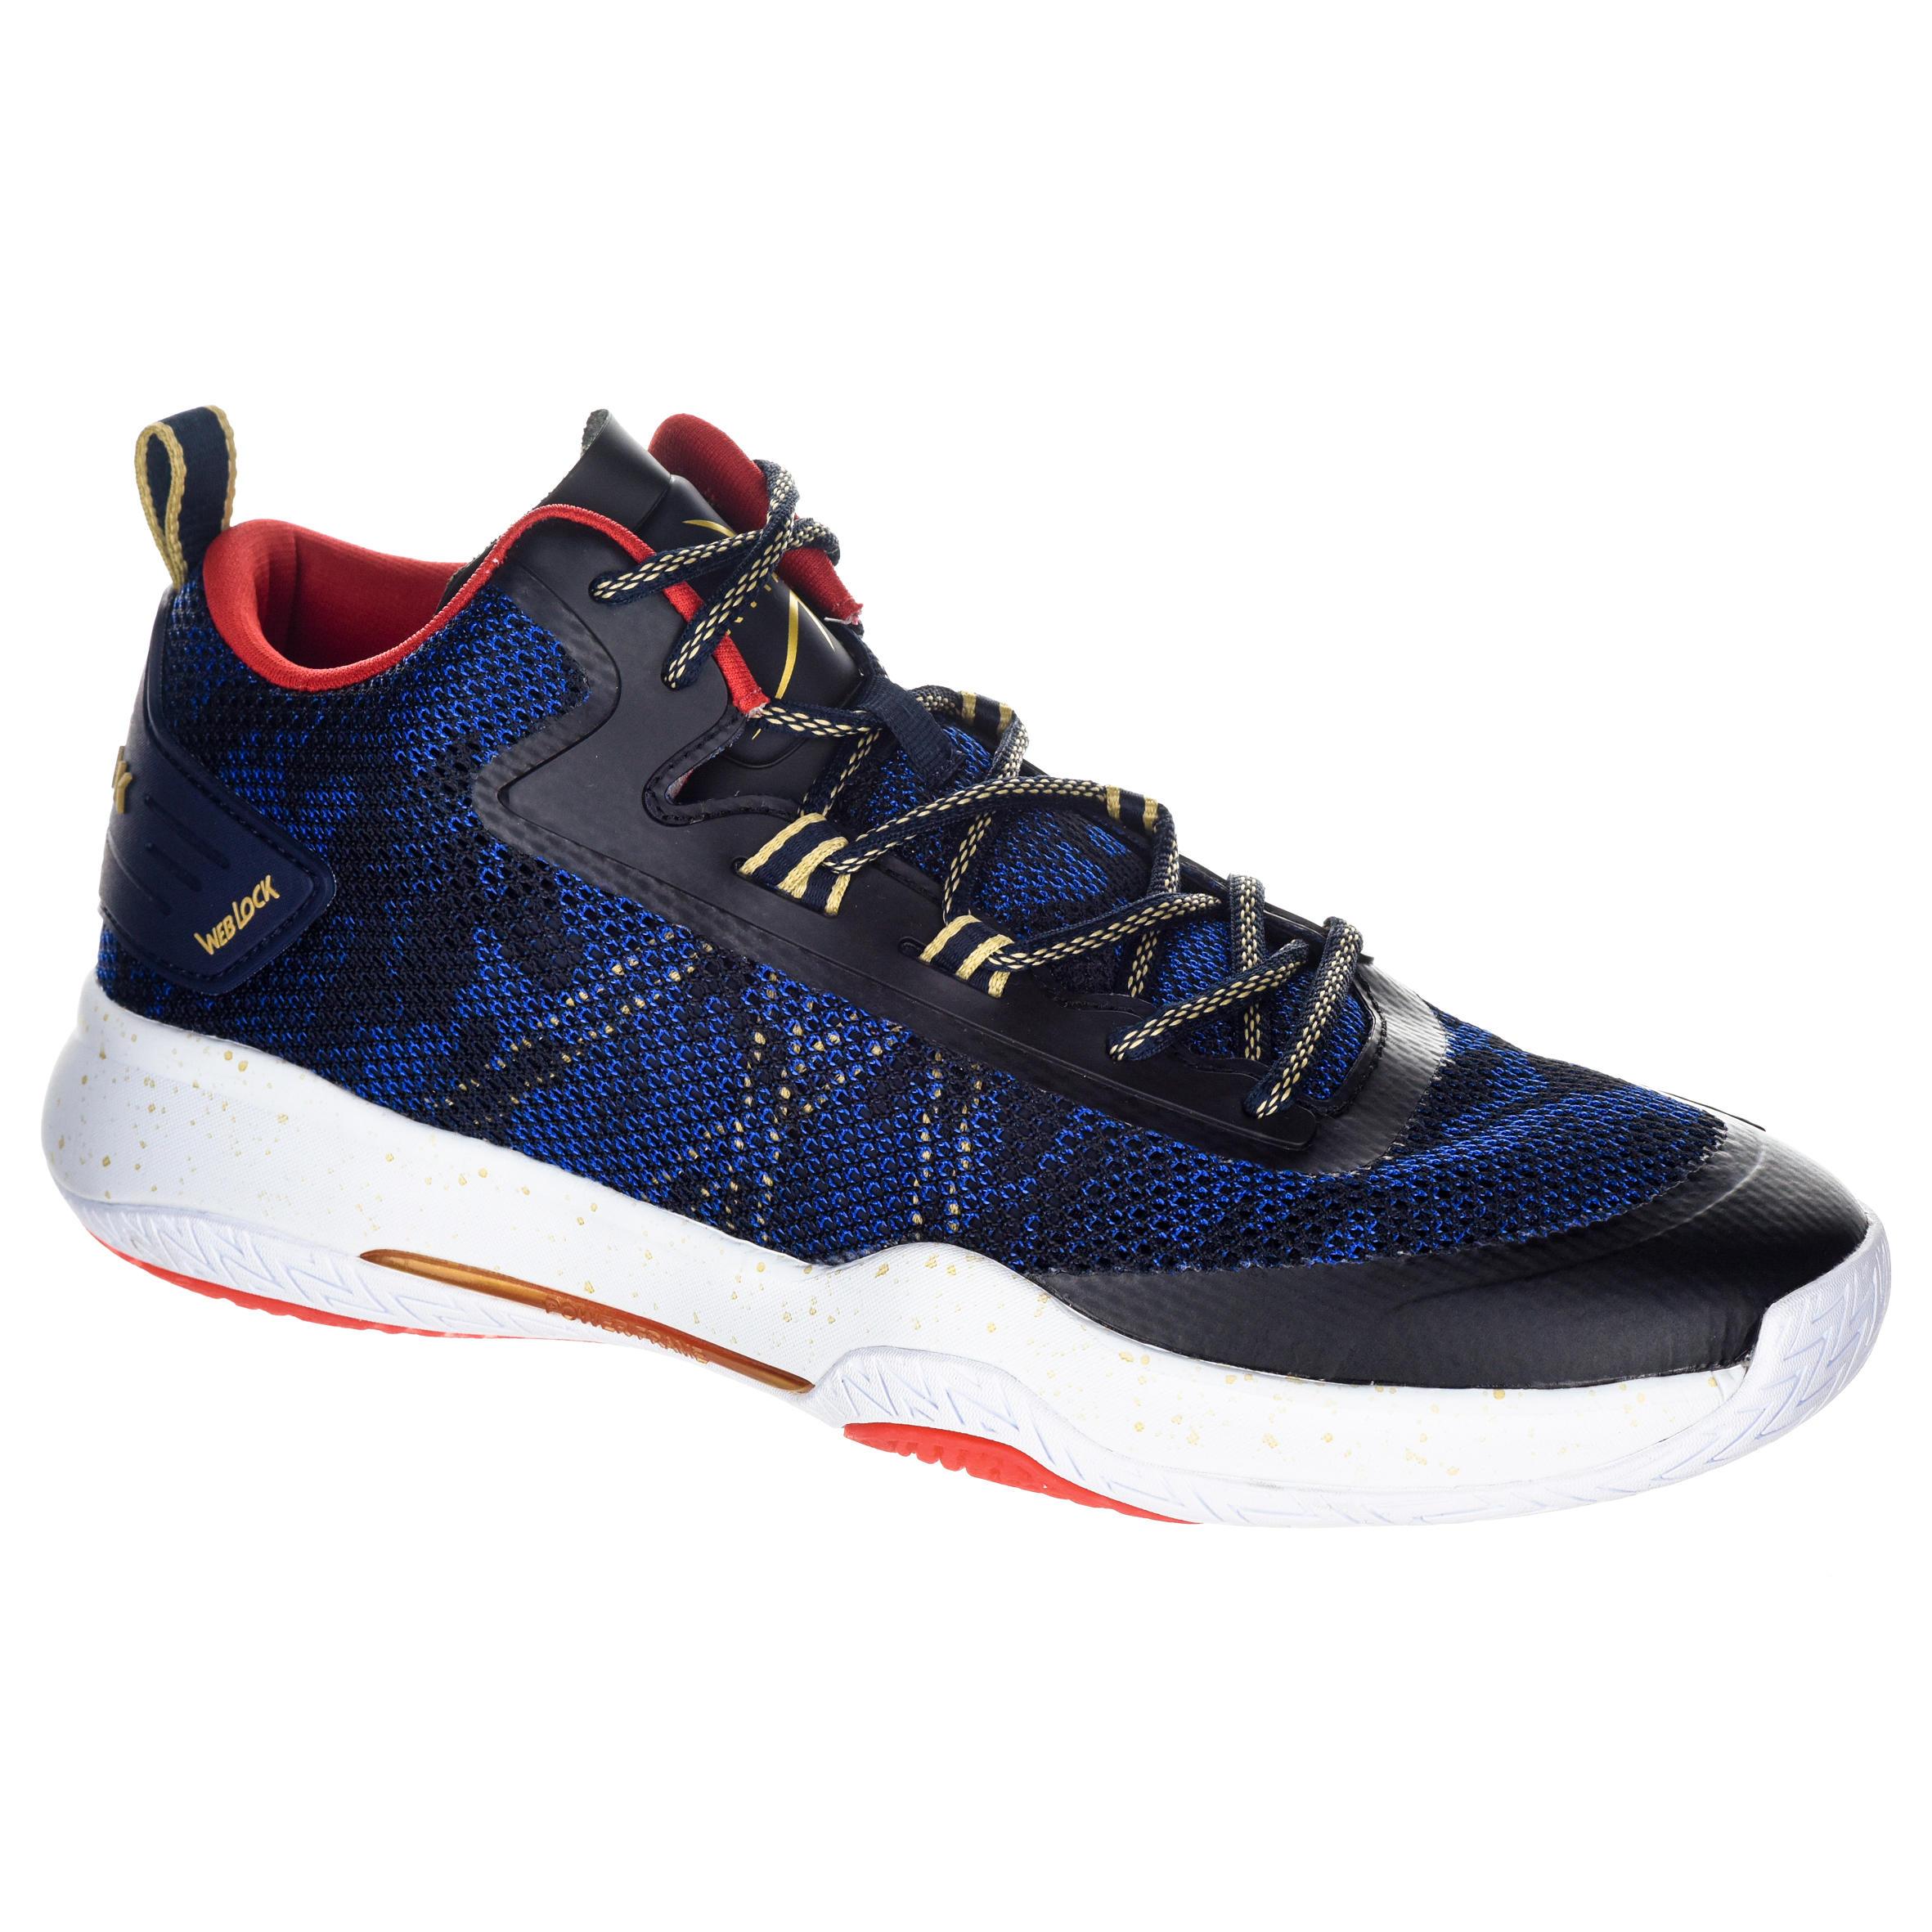 Basketballschuhe SC500 Mid Erwachsene Fortgeschrittene blau/rot/gold | Schuhe > Sportschuhe > Basketballschuhe | Tarmak